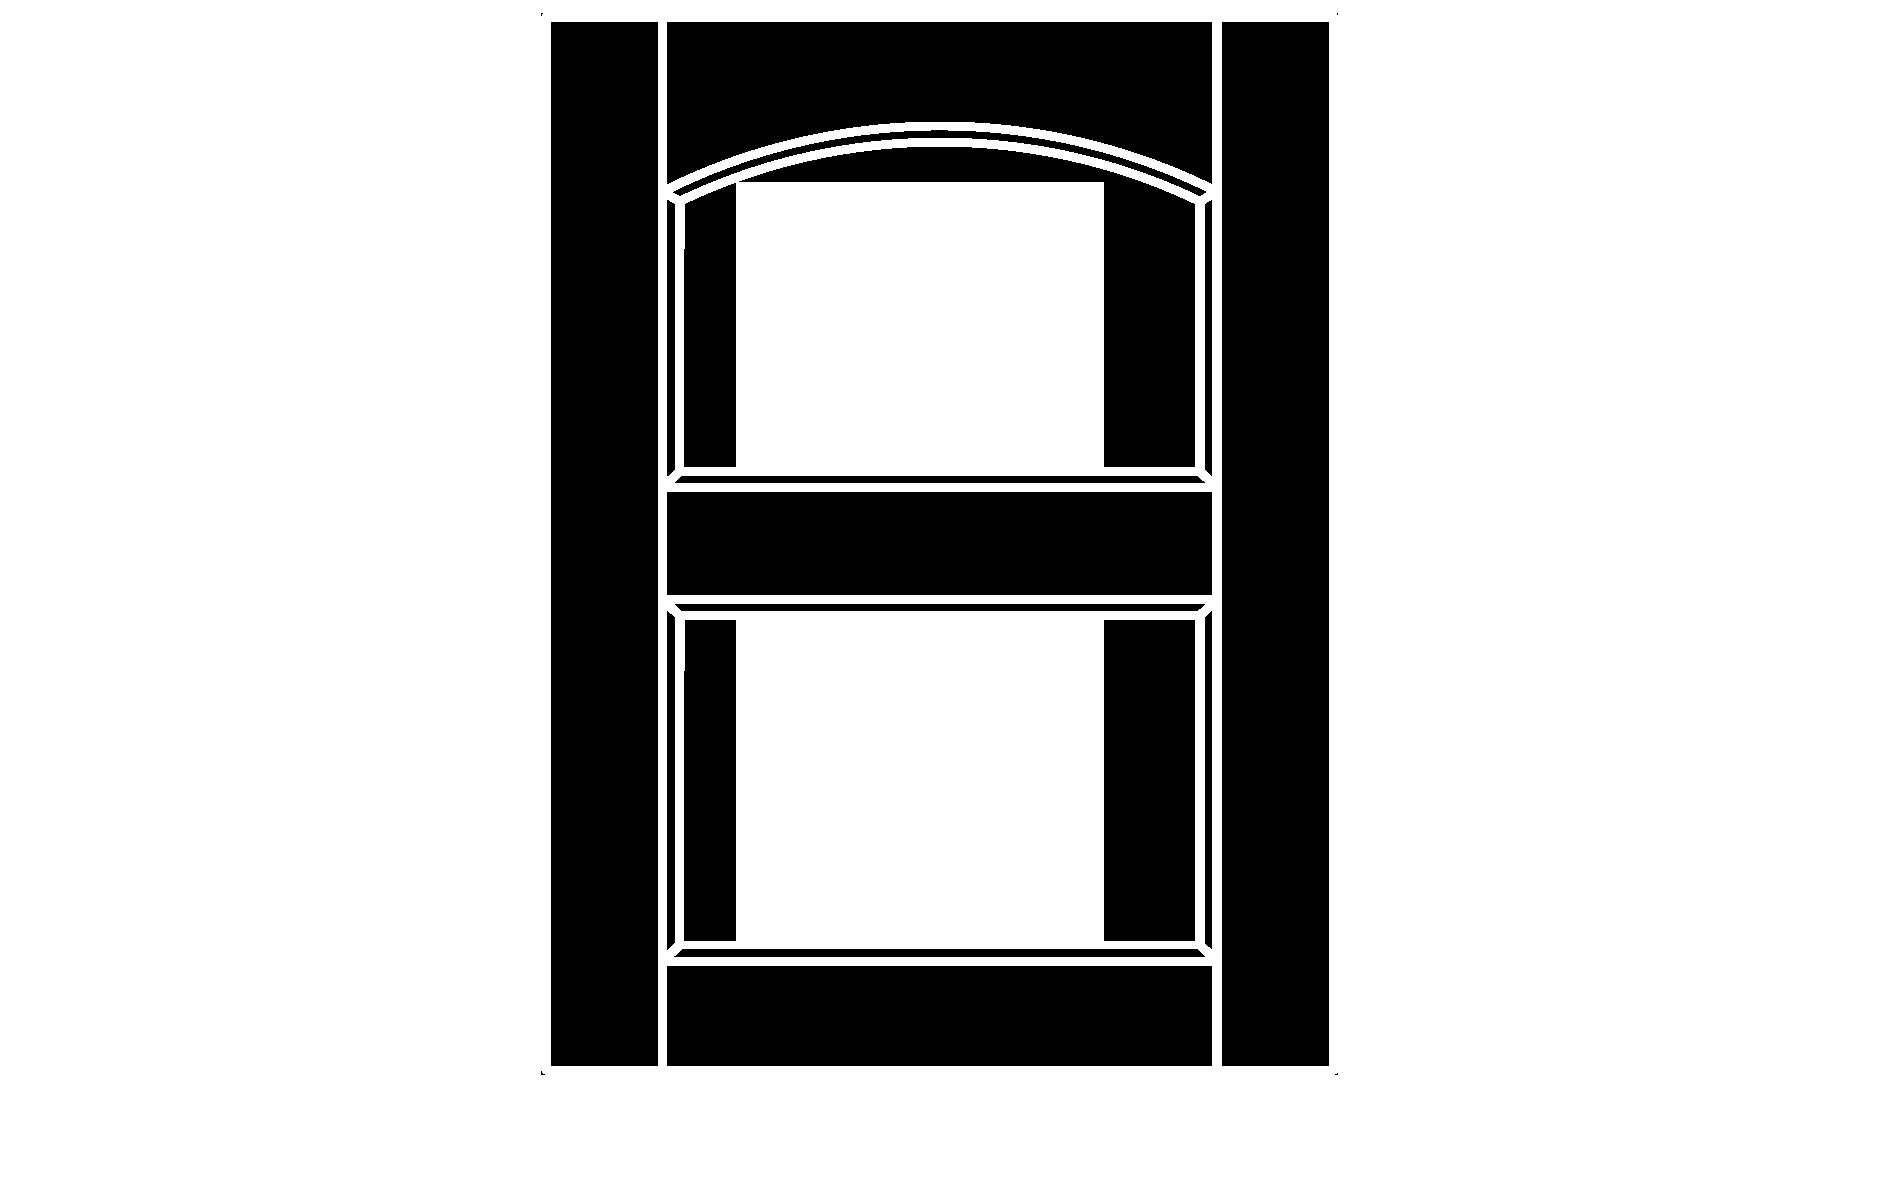 C212 cope and stick cabinet door configuration